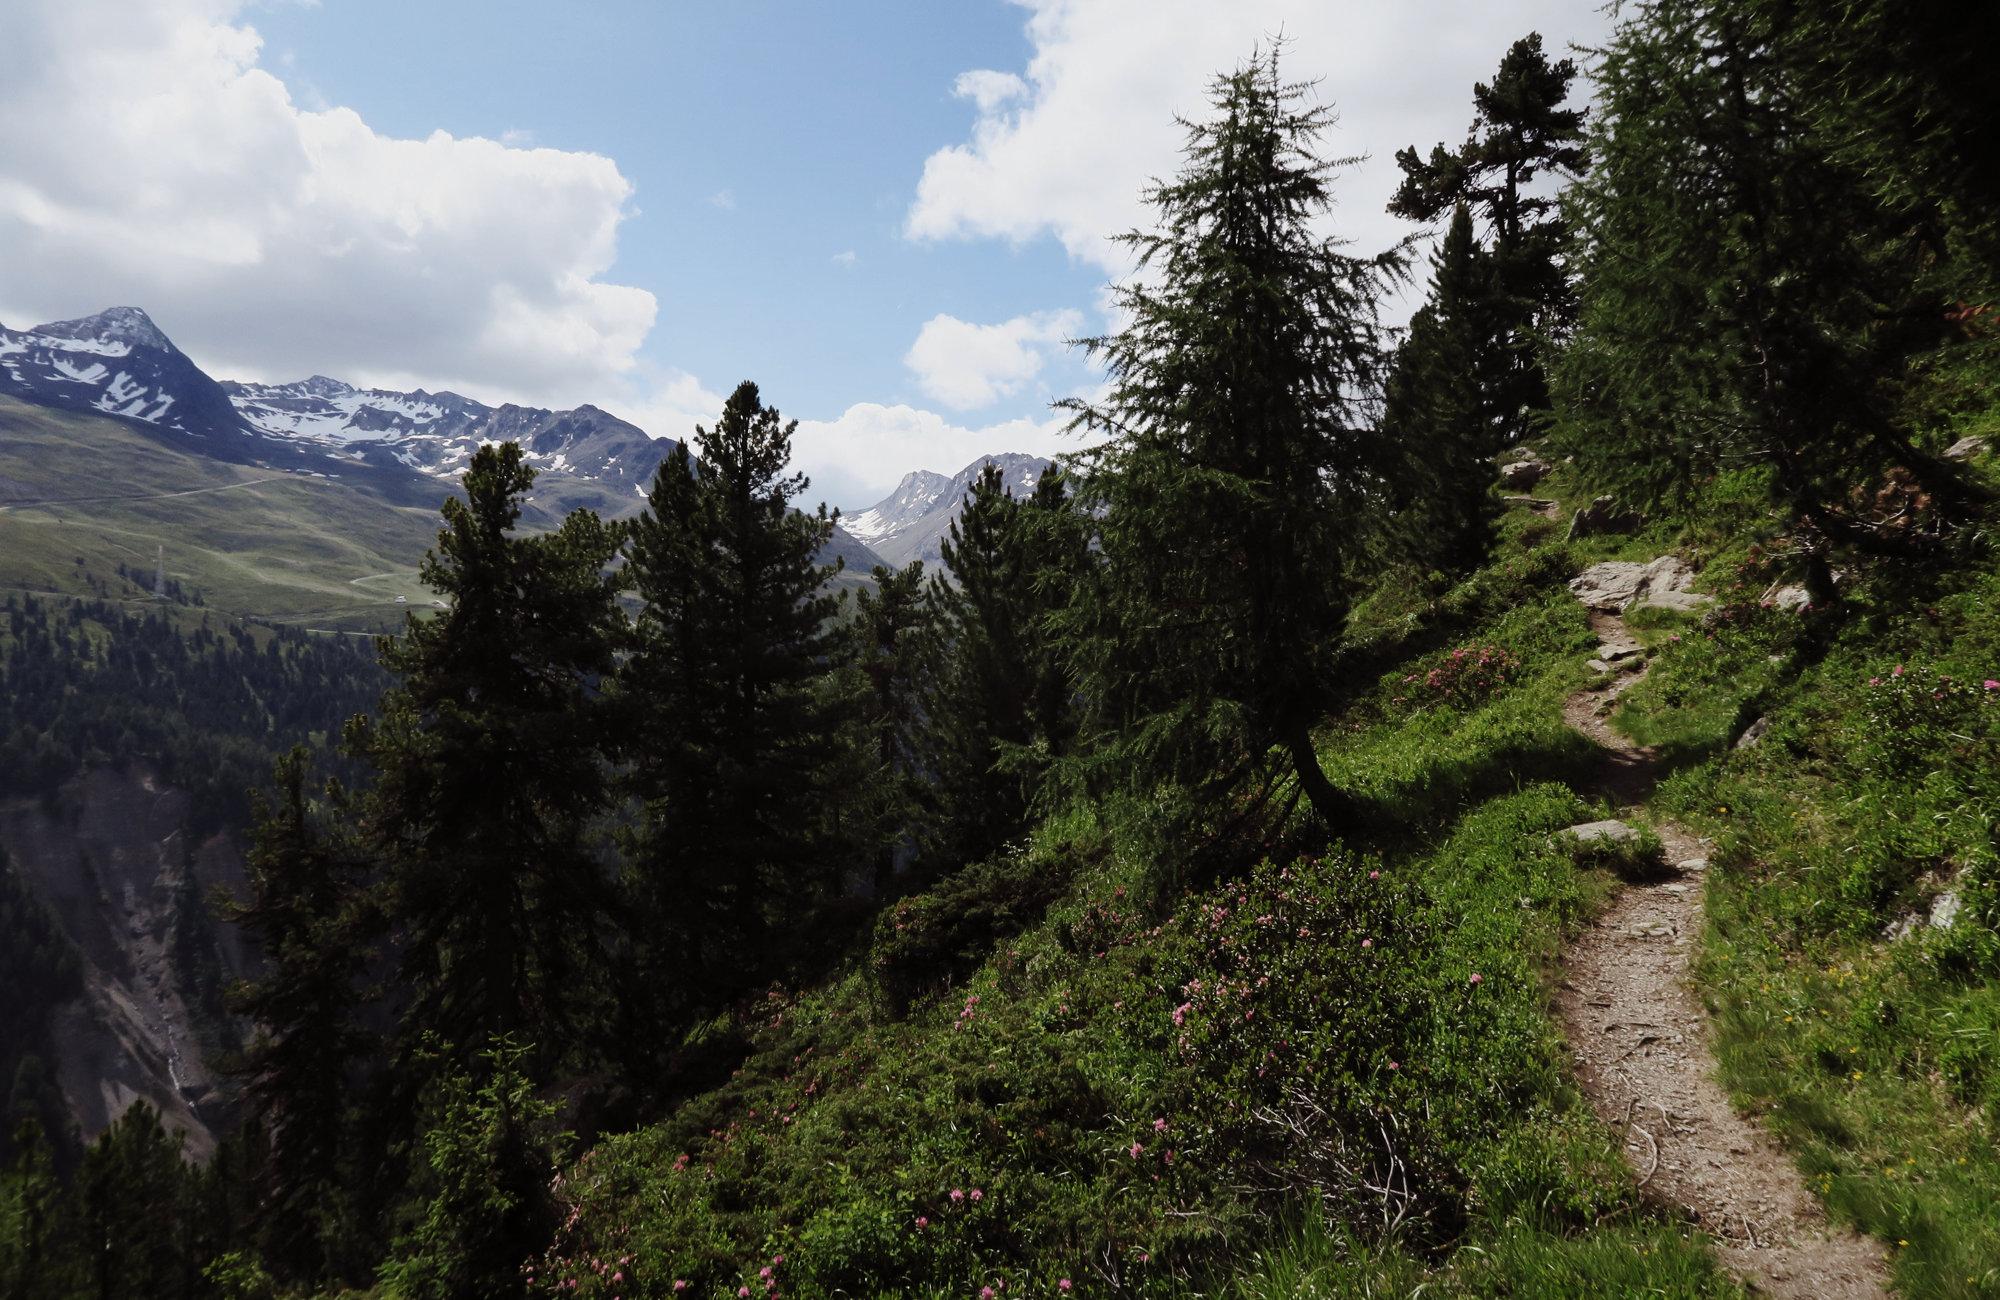 Wanderweg zum Nedersee, Wandertour Seenplatte, Wandern im Ötztal, Wandertour Ötztal, Ötztaler Alpen, Bergwandern, Tirol